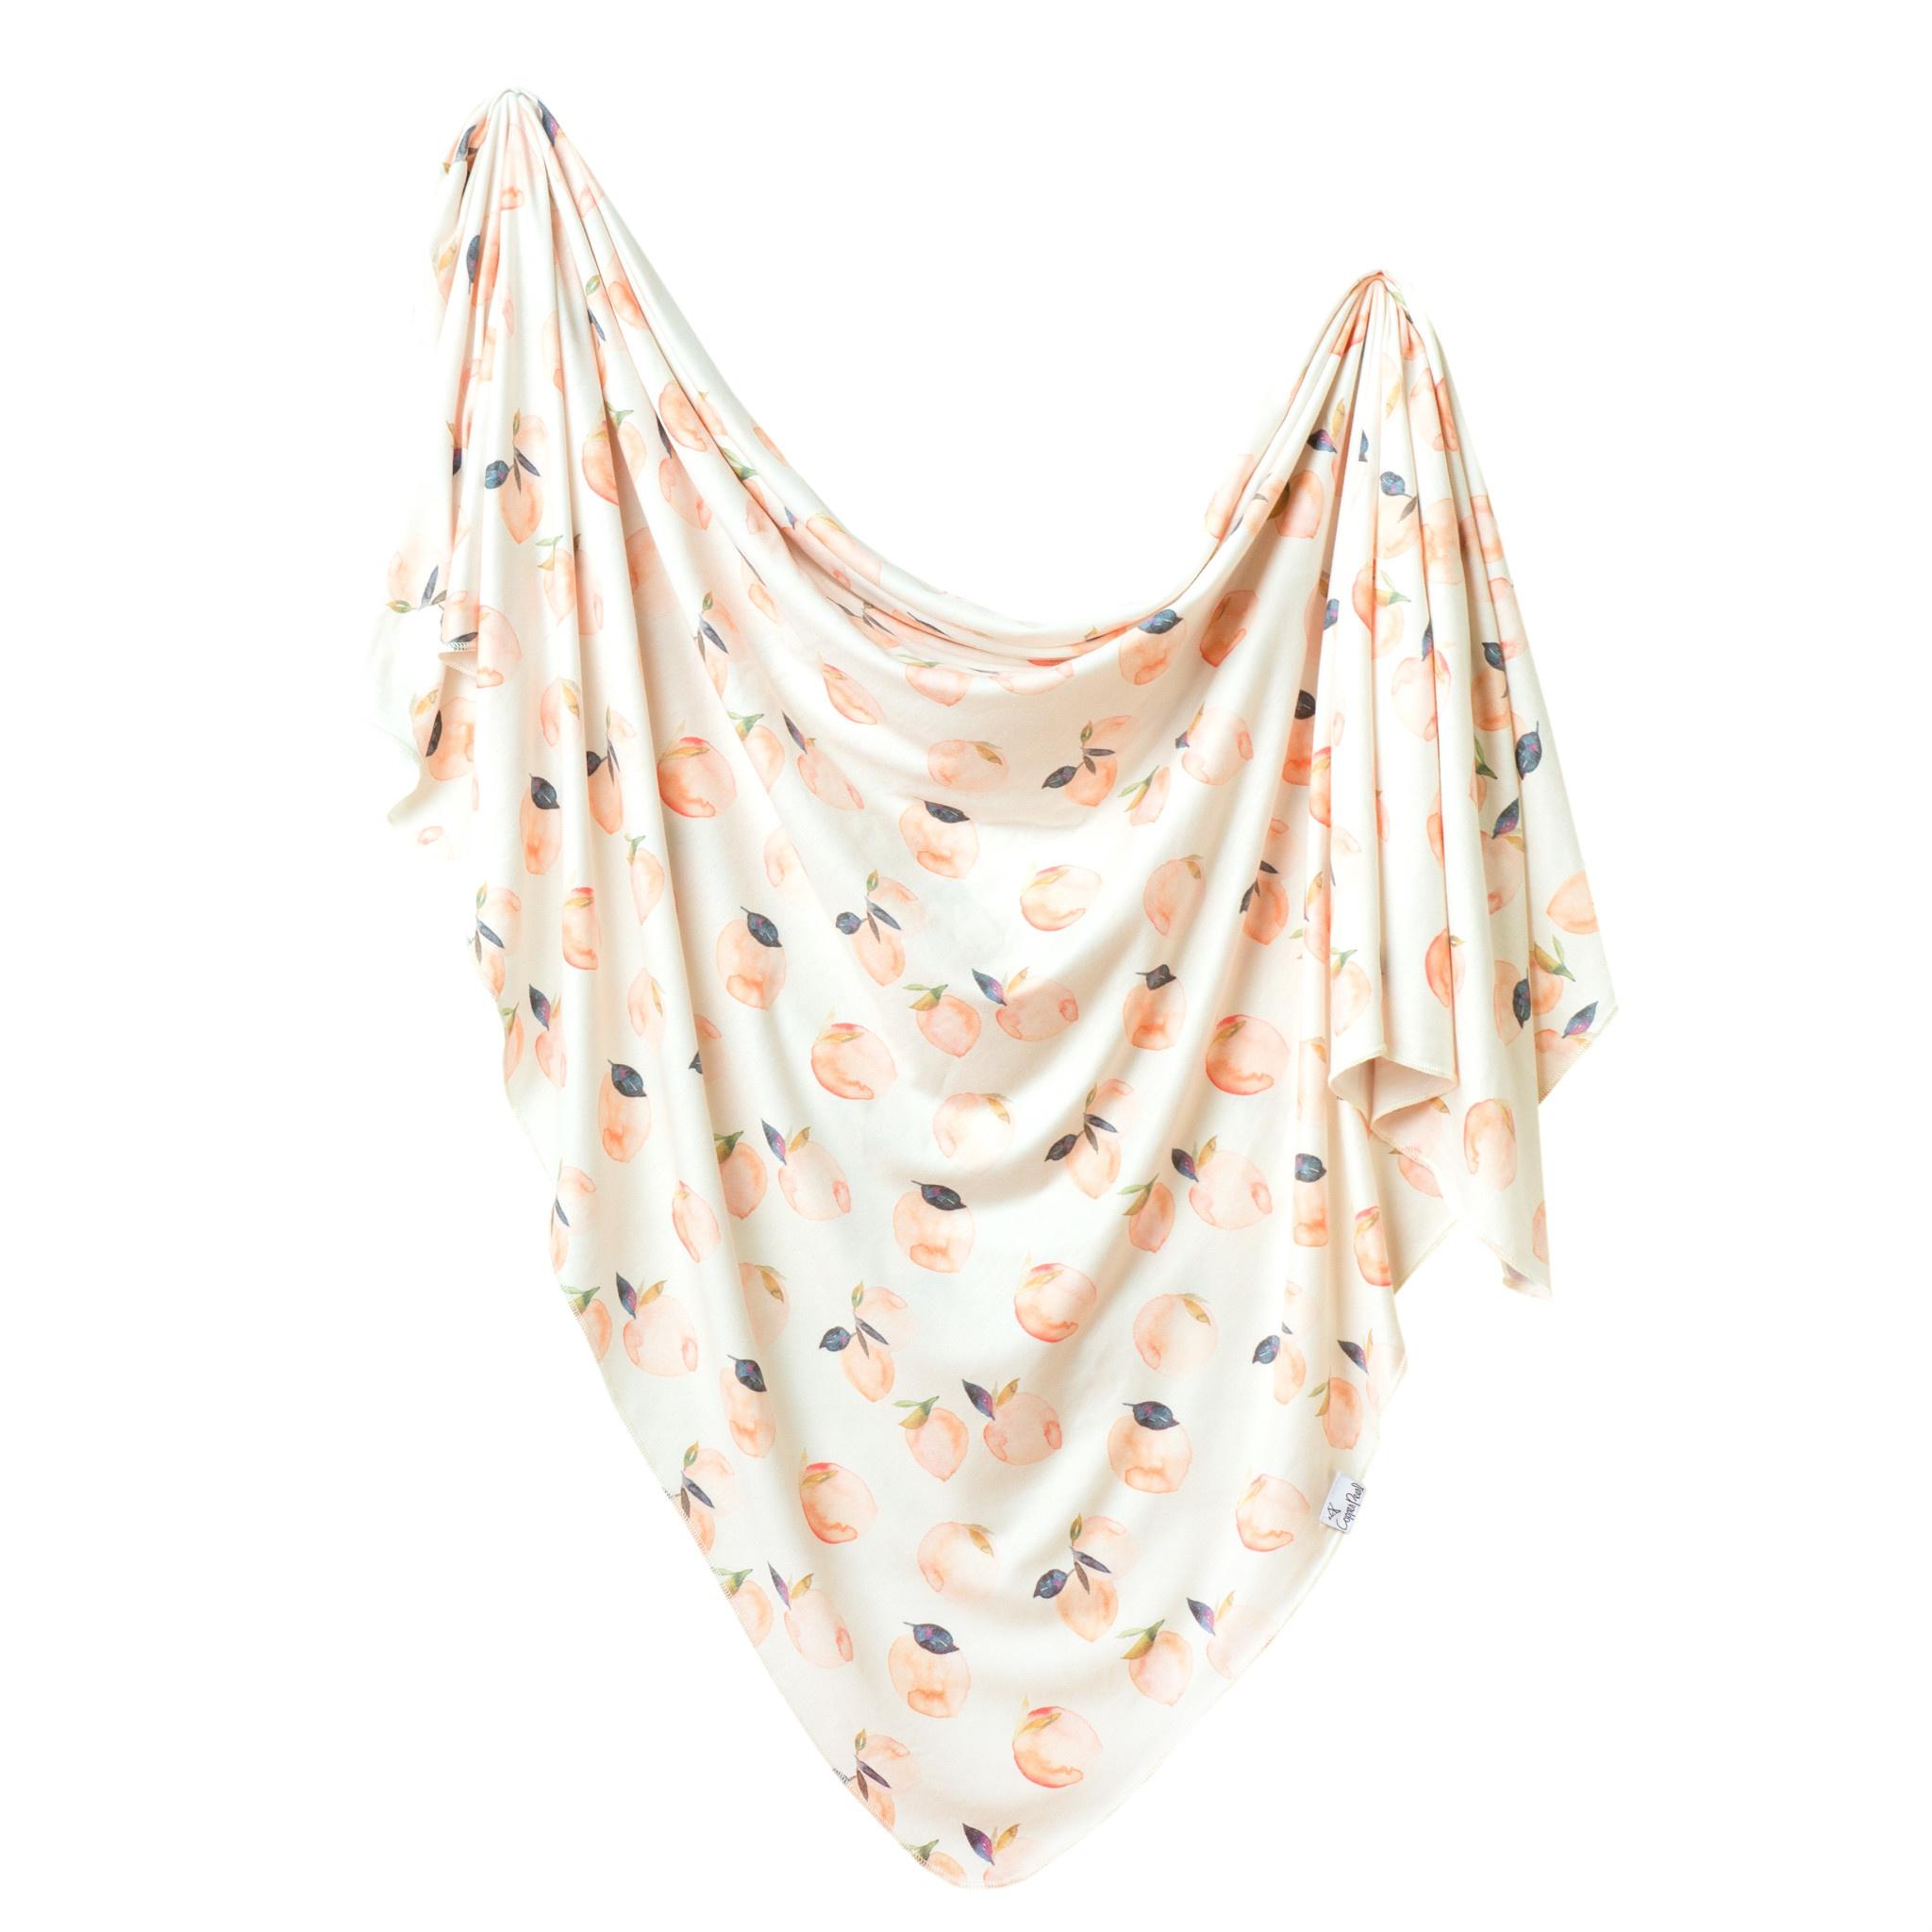 Copper Pearl Knit Swaddle Blanket Caroline